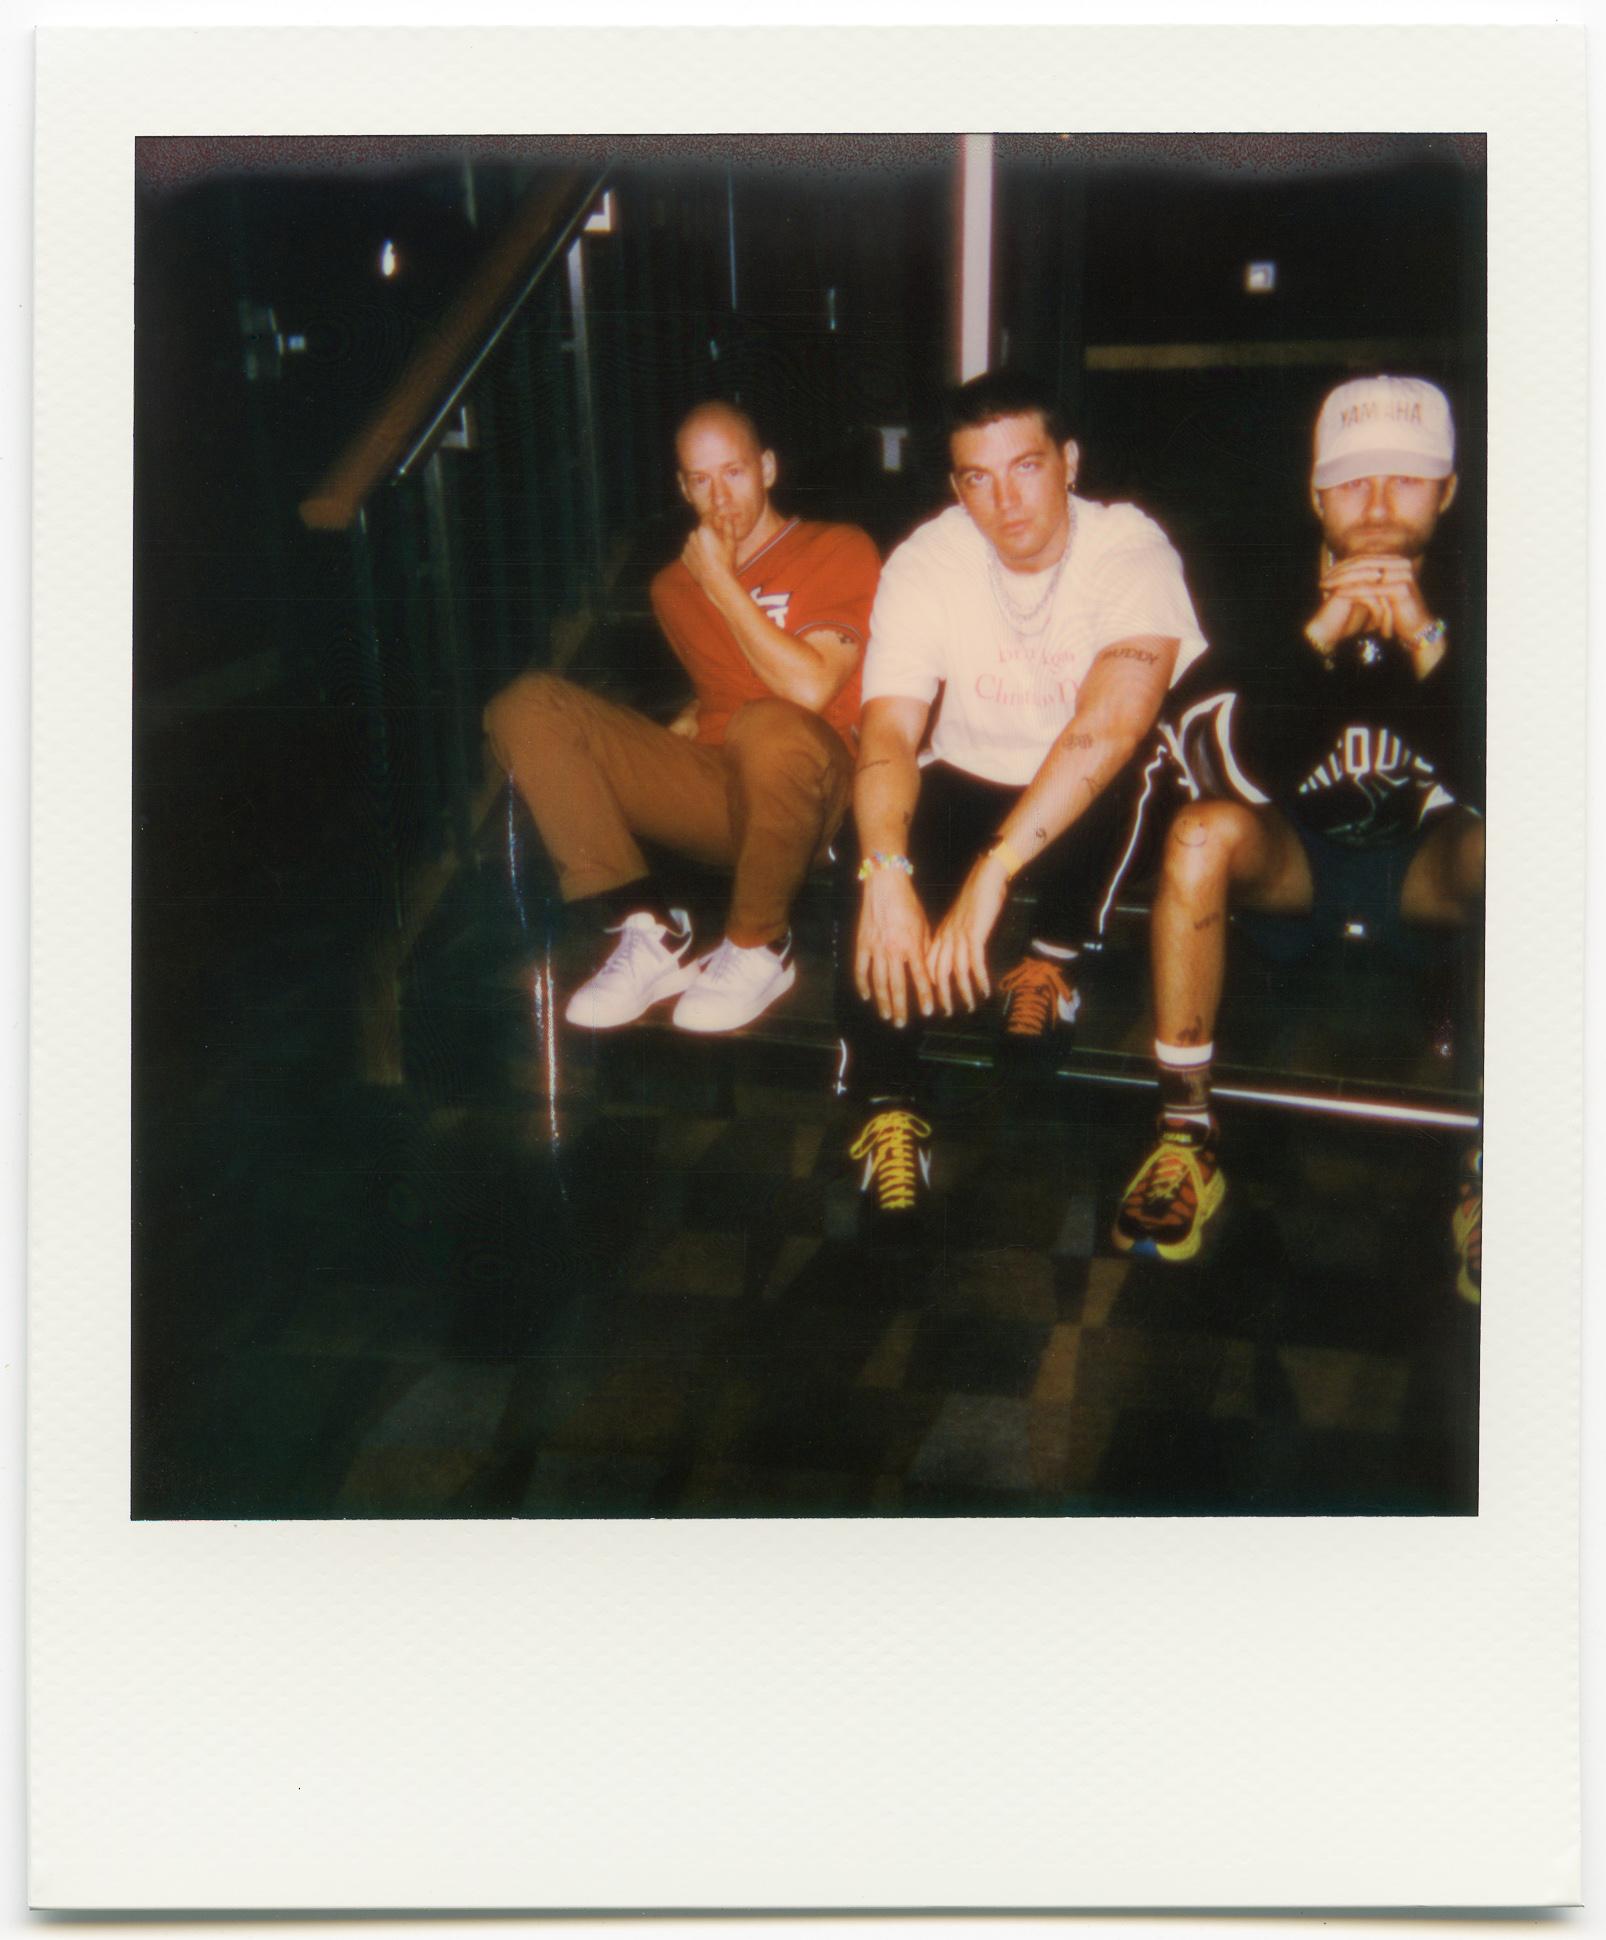 LANY-Polaroid-17-06-2019-Vancouver-10.jpg